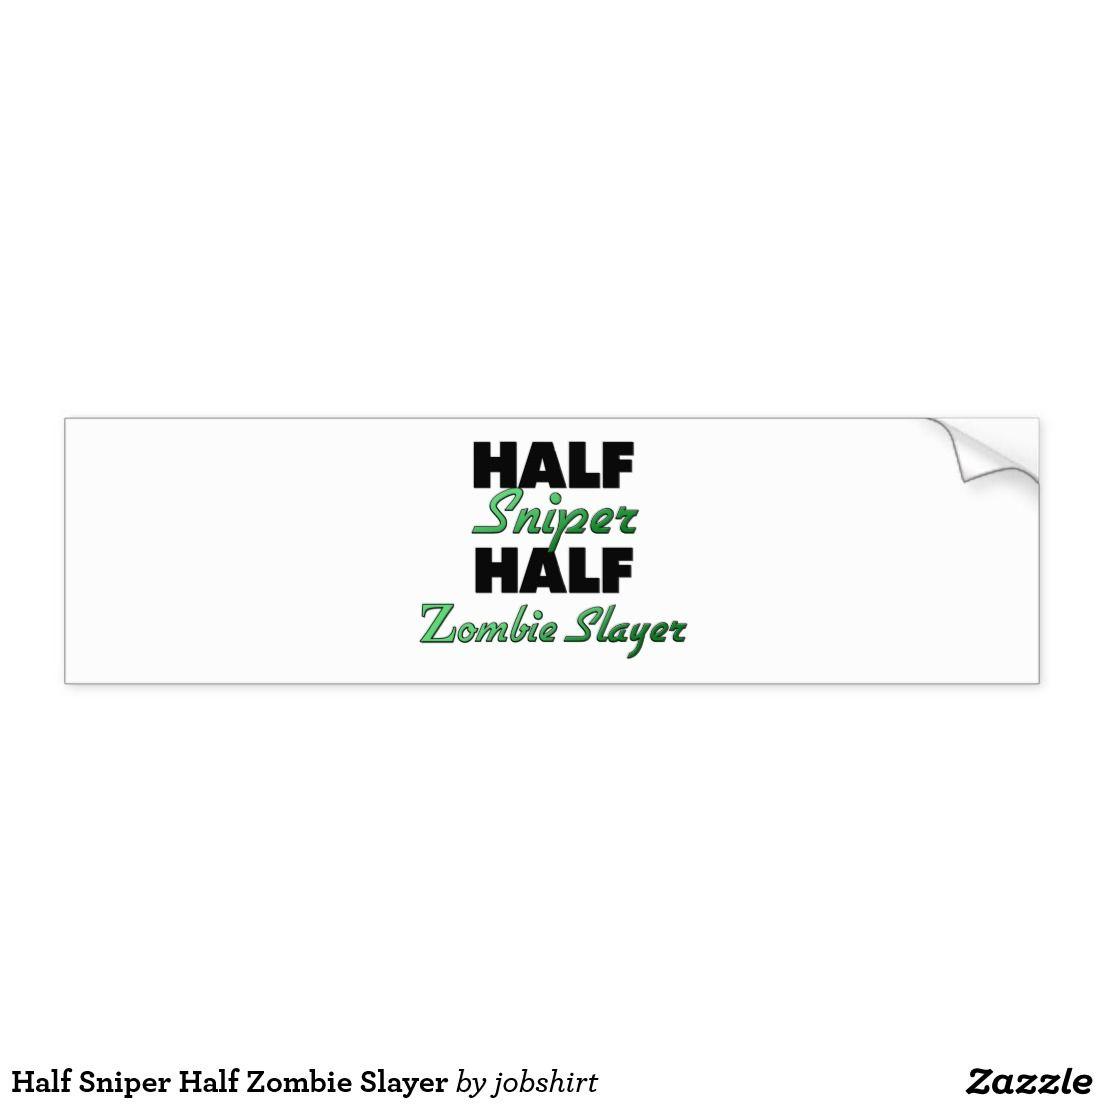 Half Sniper Half Zombie Slayer Bumper Sticker